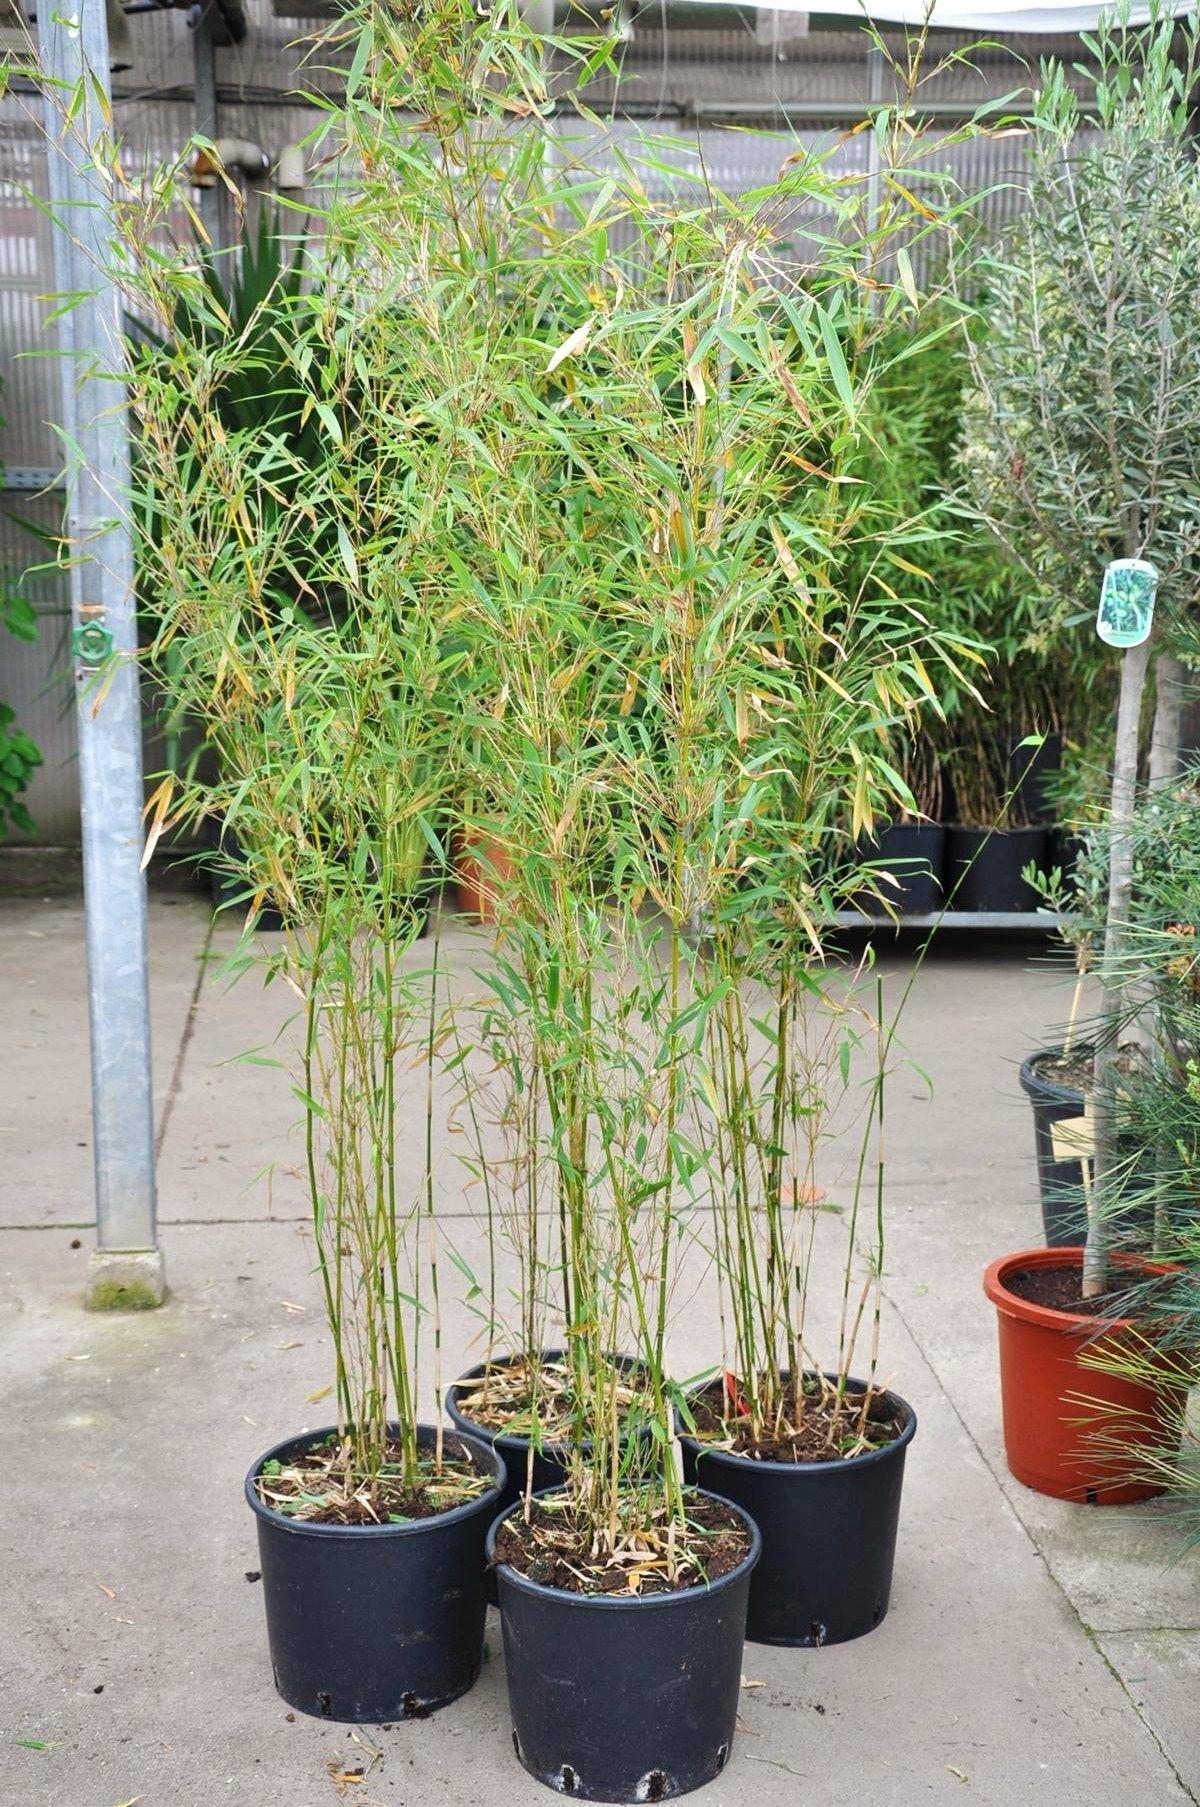 bambus hoher heckenbambus 15 liter bambus pflanzen. Black Bedroom Furniture Sets. Home Design Ideas